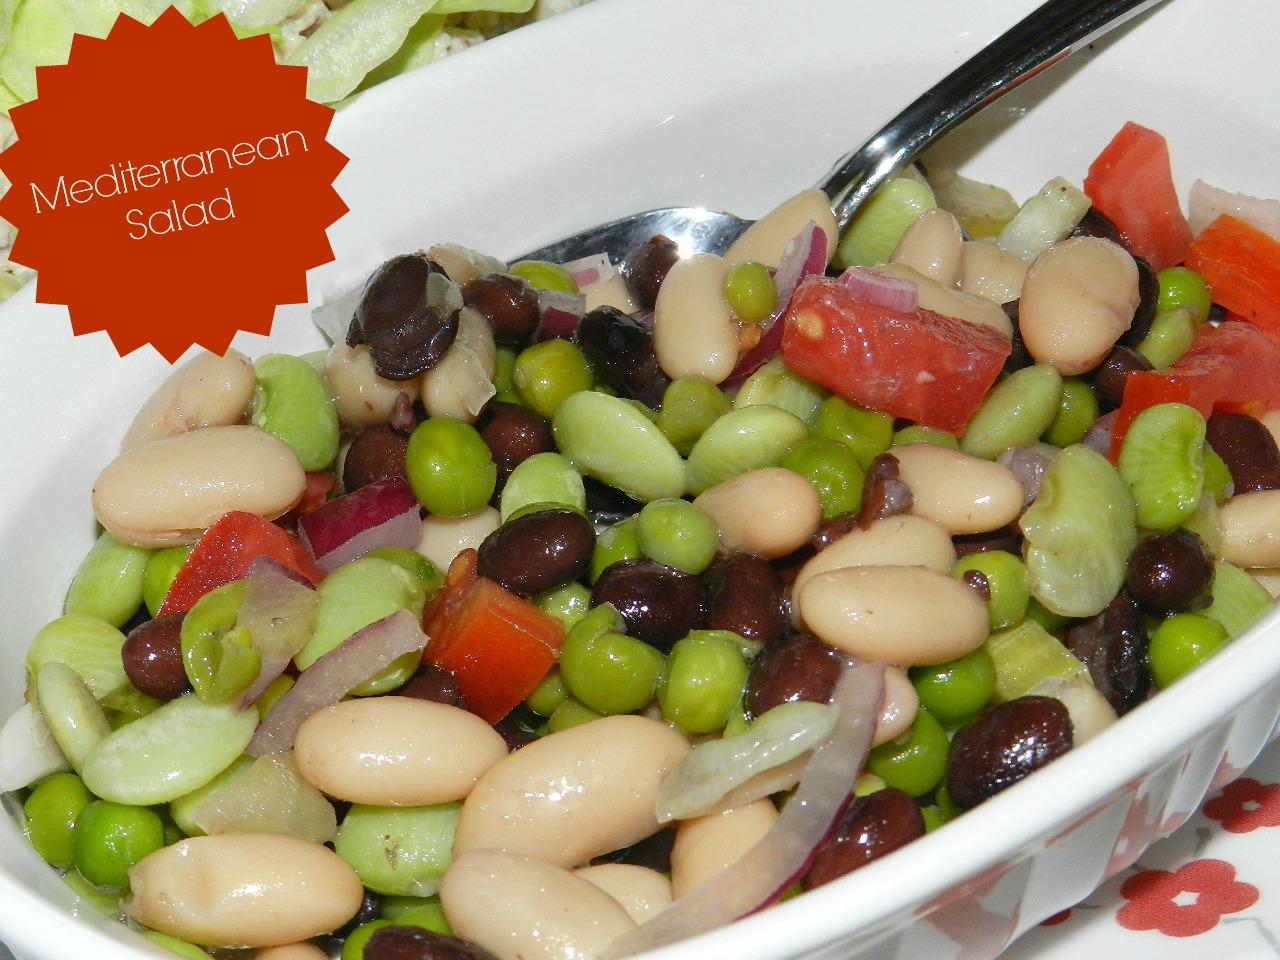 Momma's Mediterranean Salad